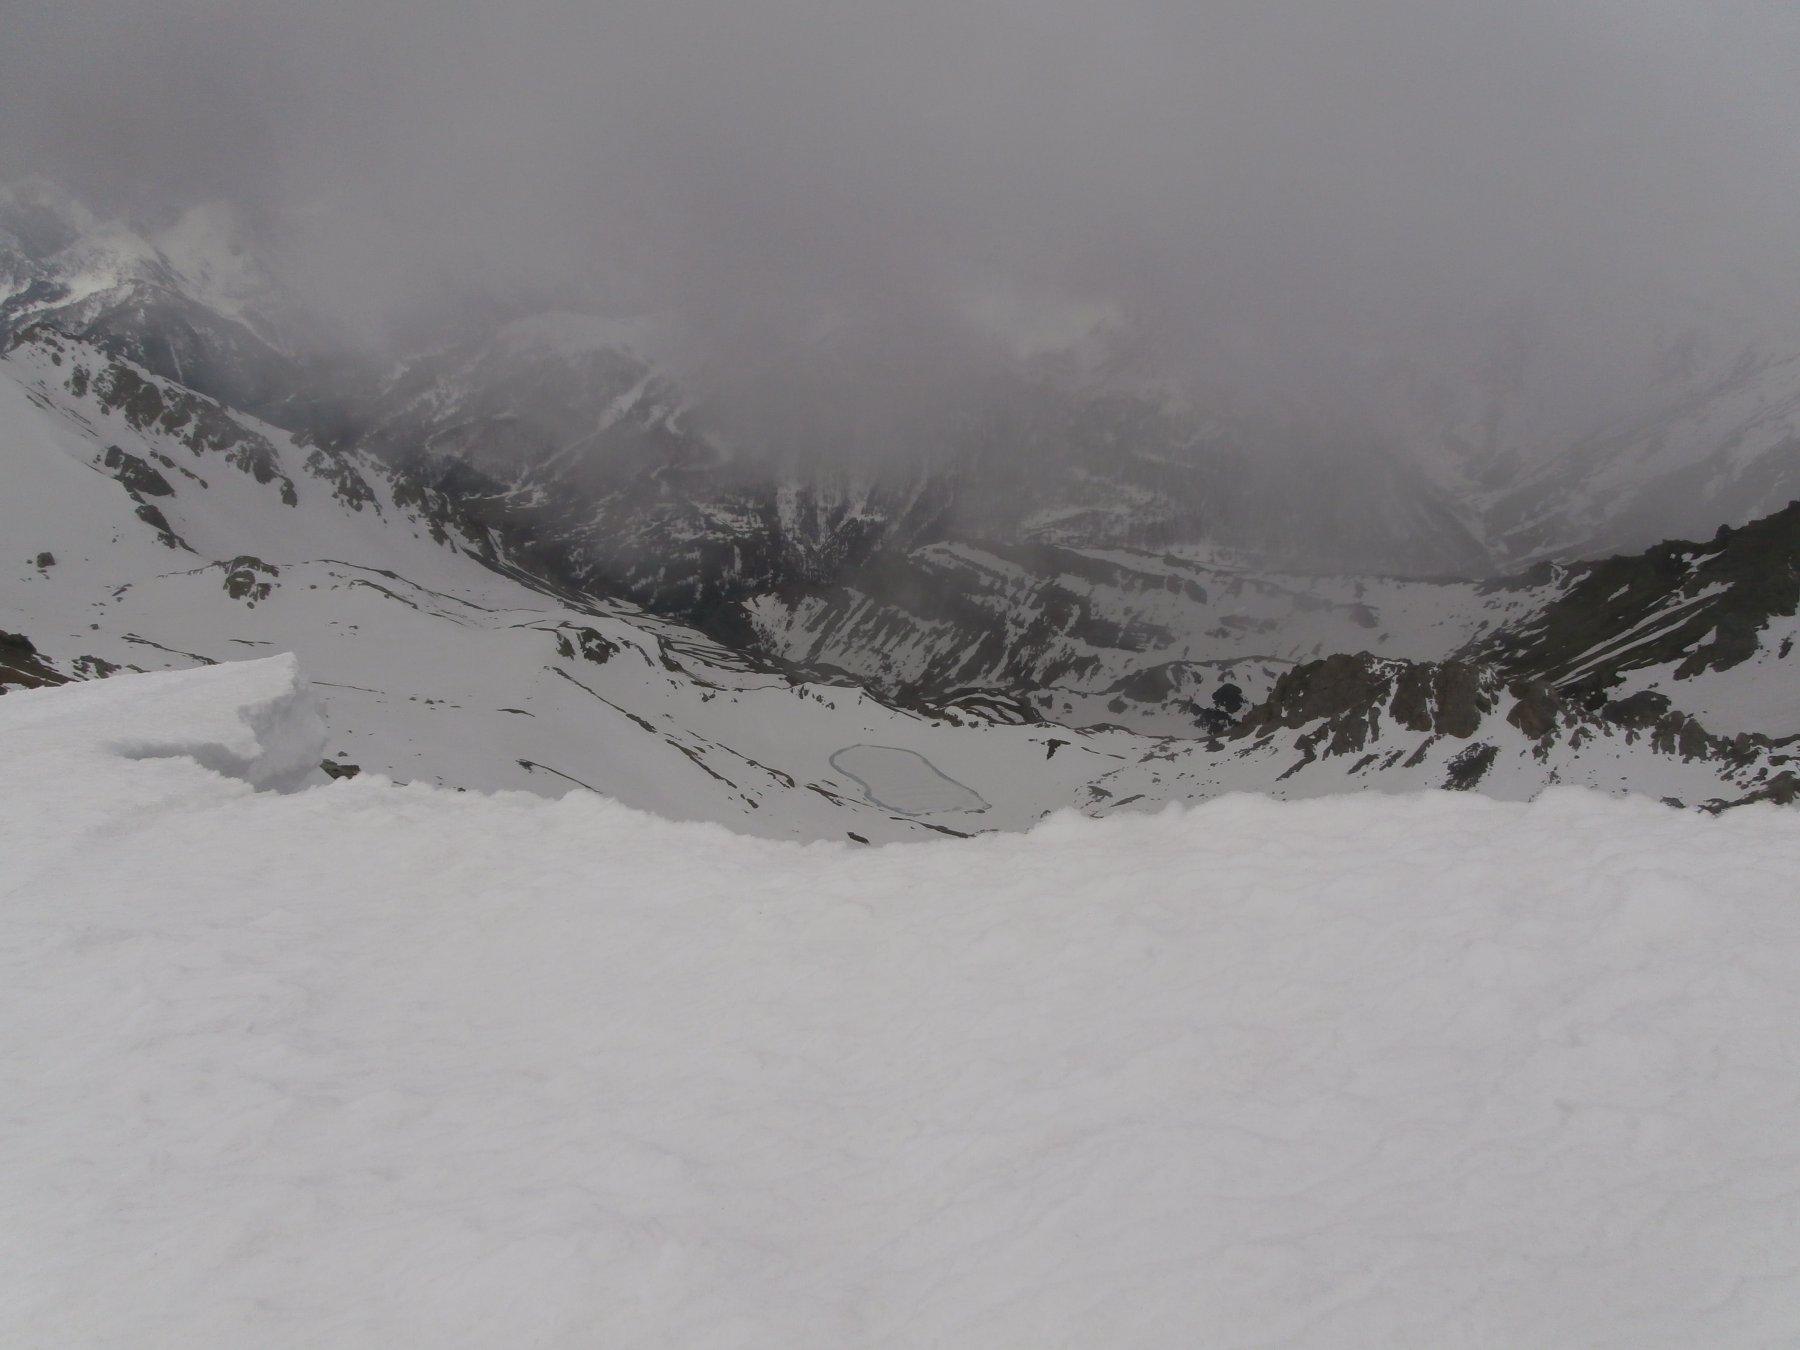 valle Stura e lago sup. di Roburent